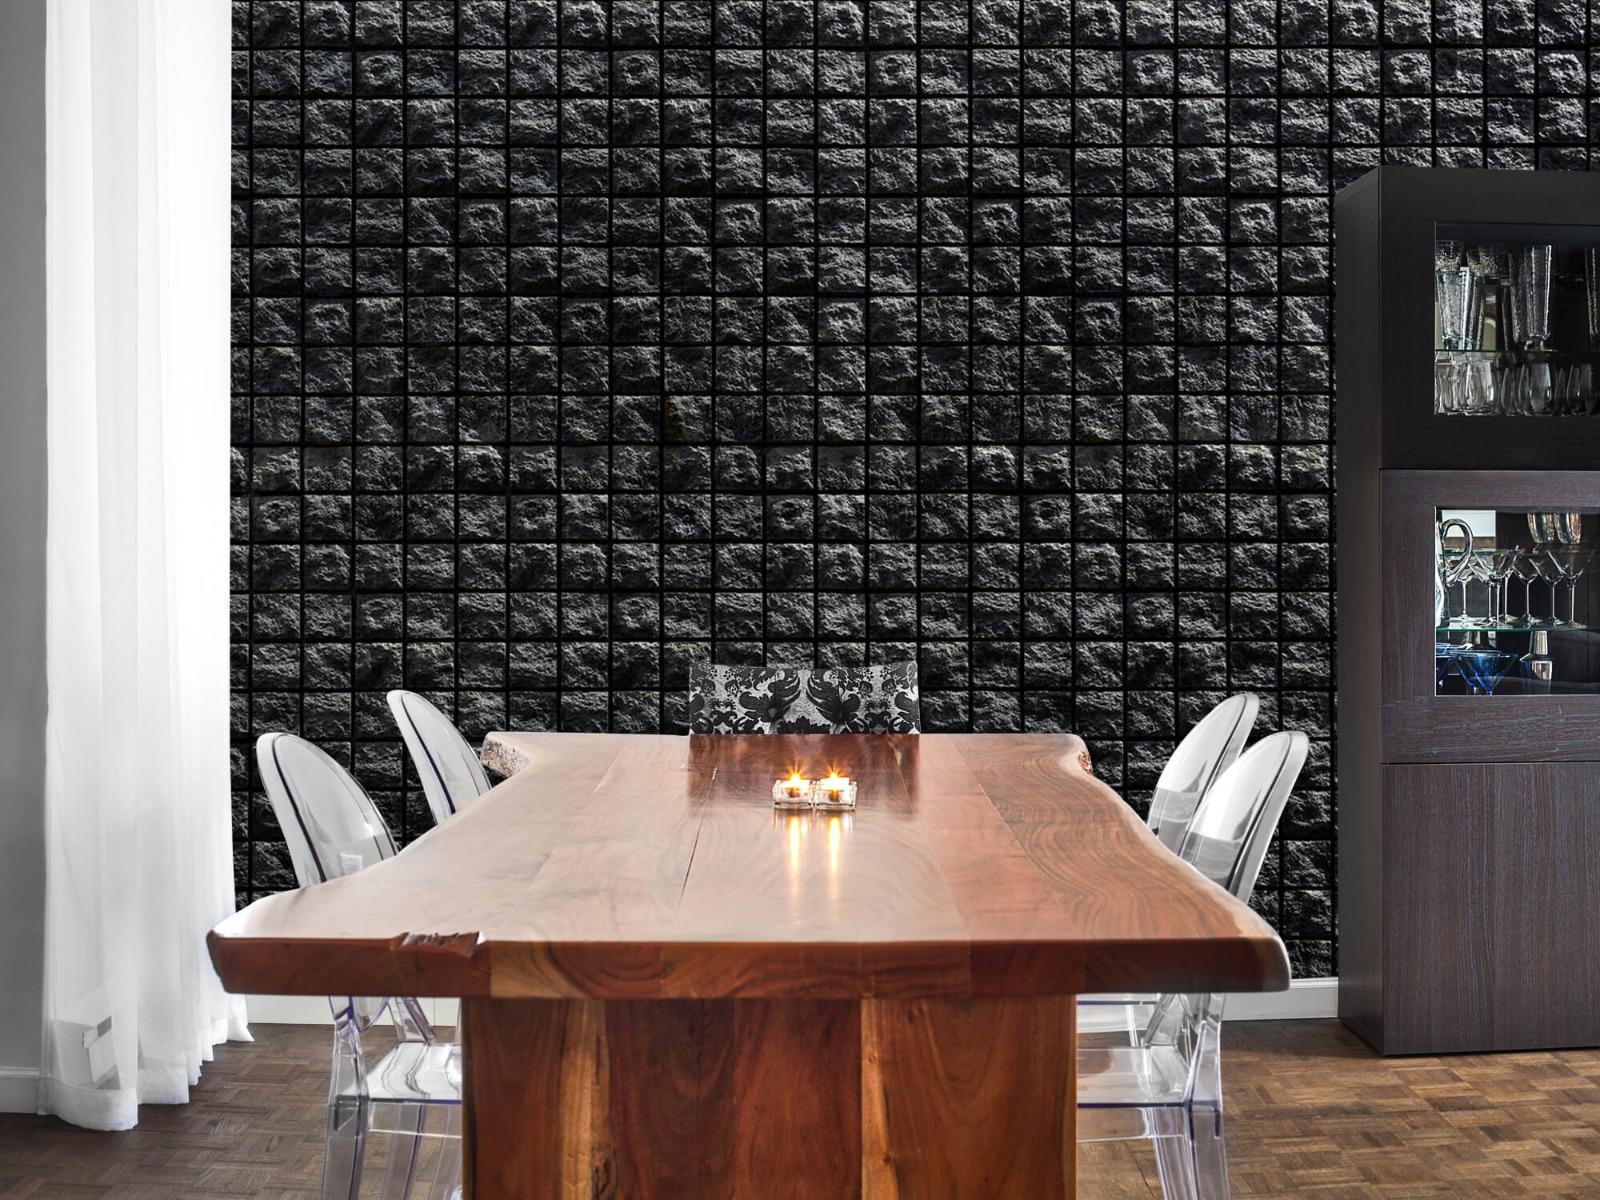 Tegel behang - Vierkante zwarte stenen - Wallexclusive - Woonkamer 2